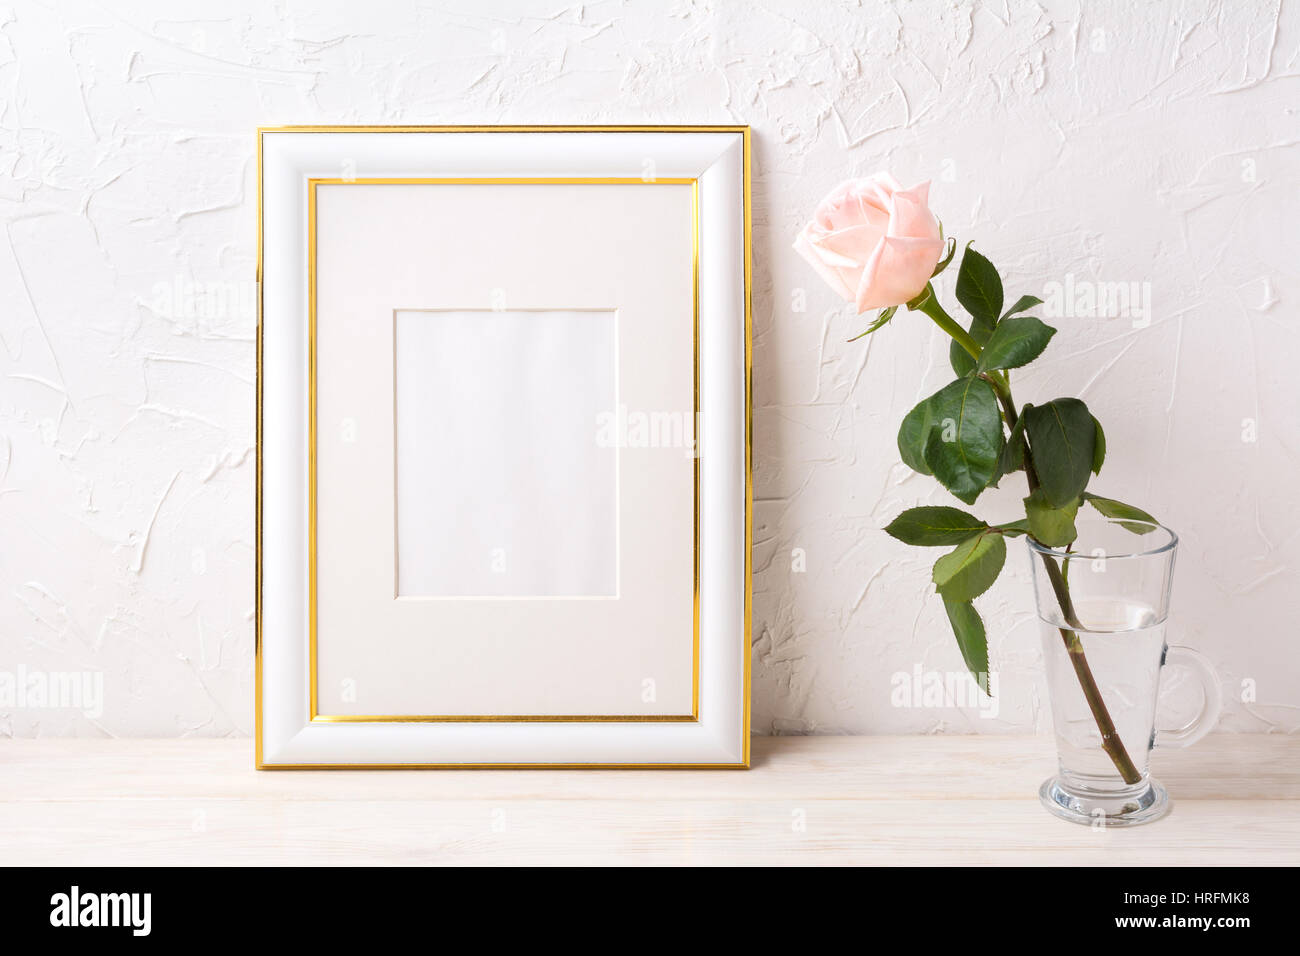 Verzierte Goldrahmen Mockup mit zart rosa Rose im Glas. Leere Rahmen ...